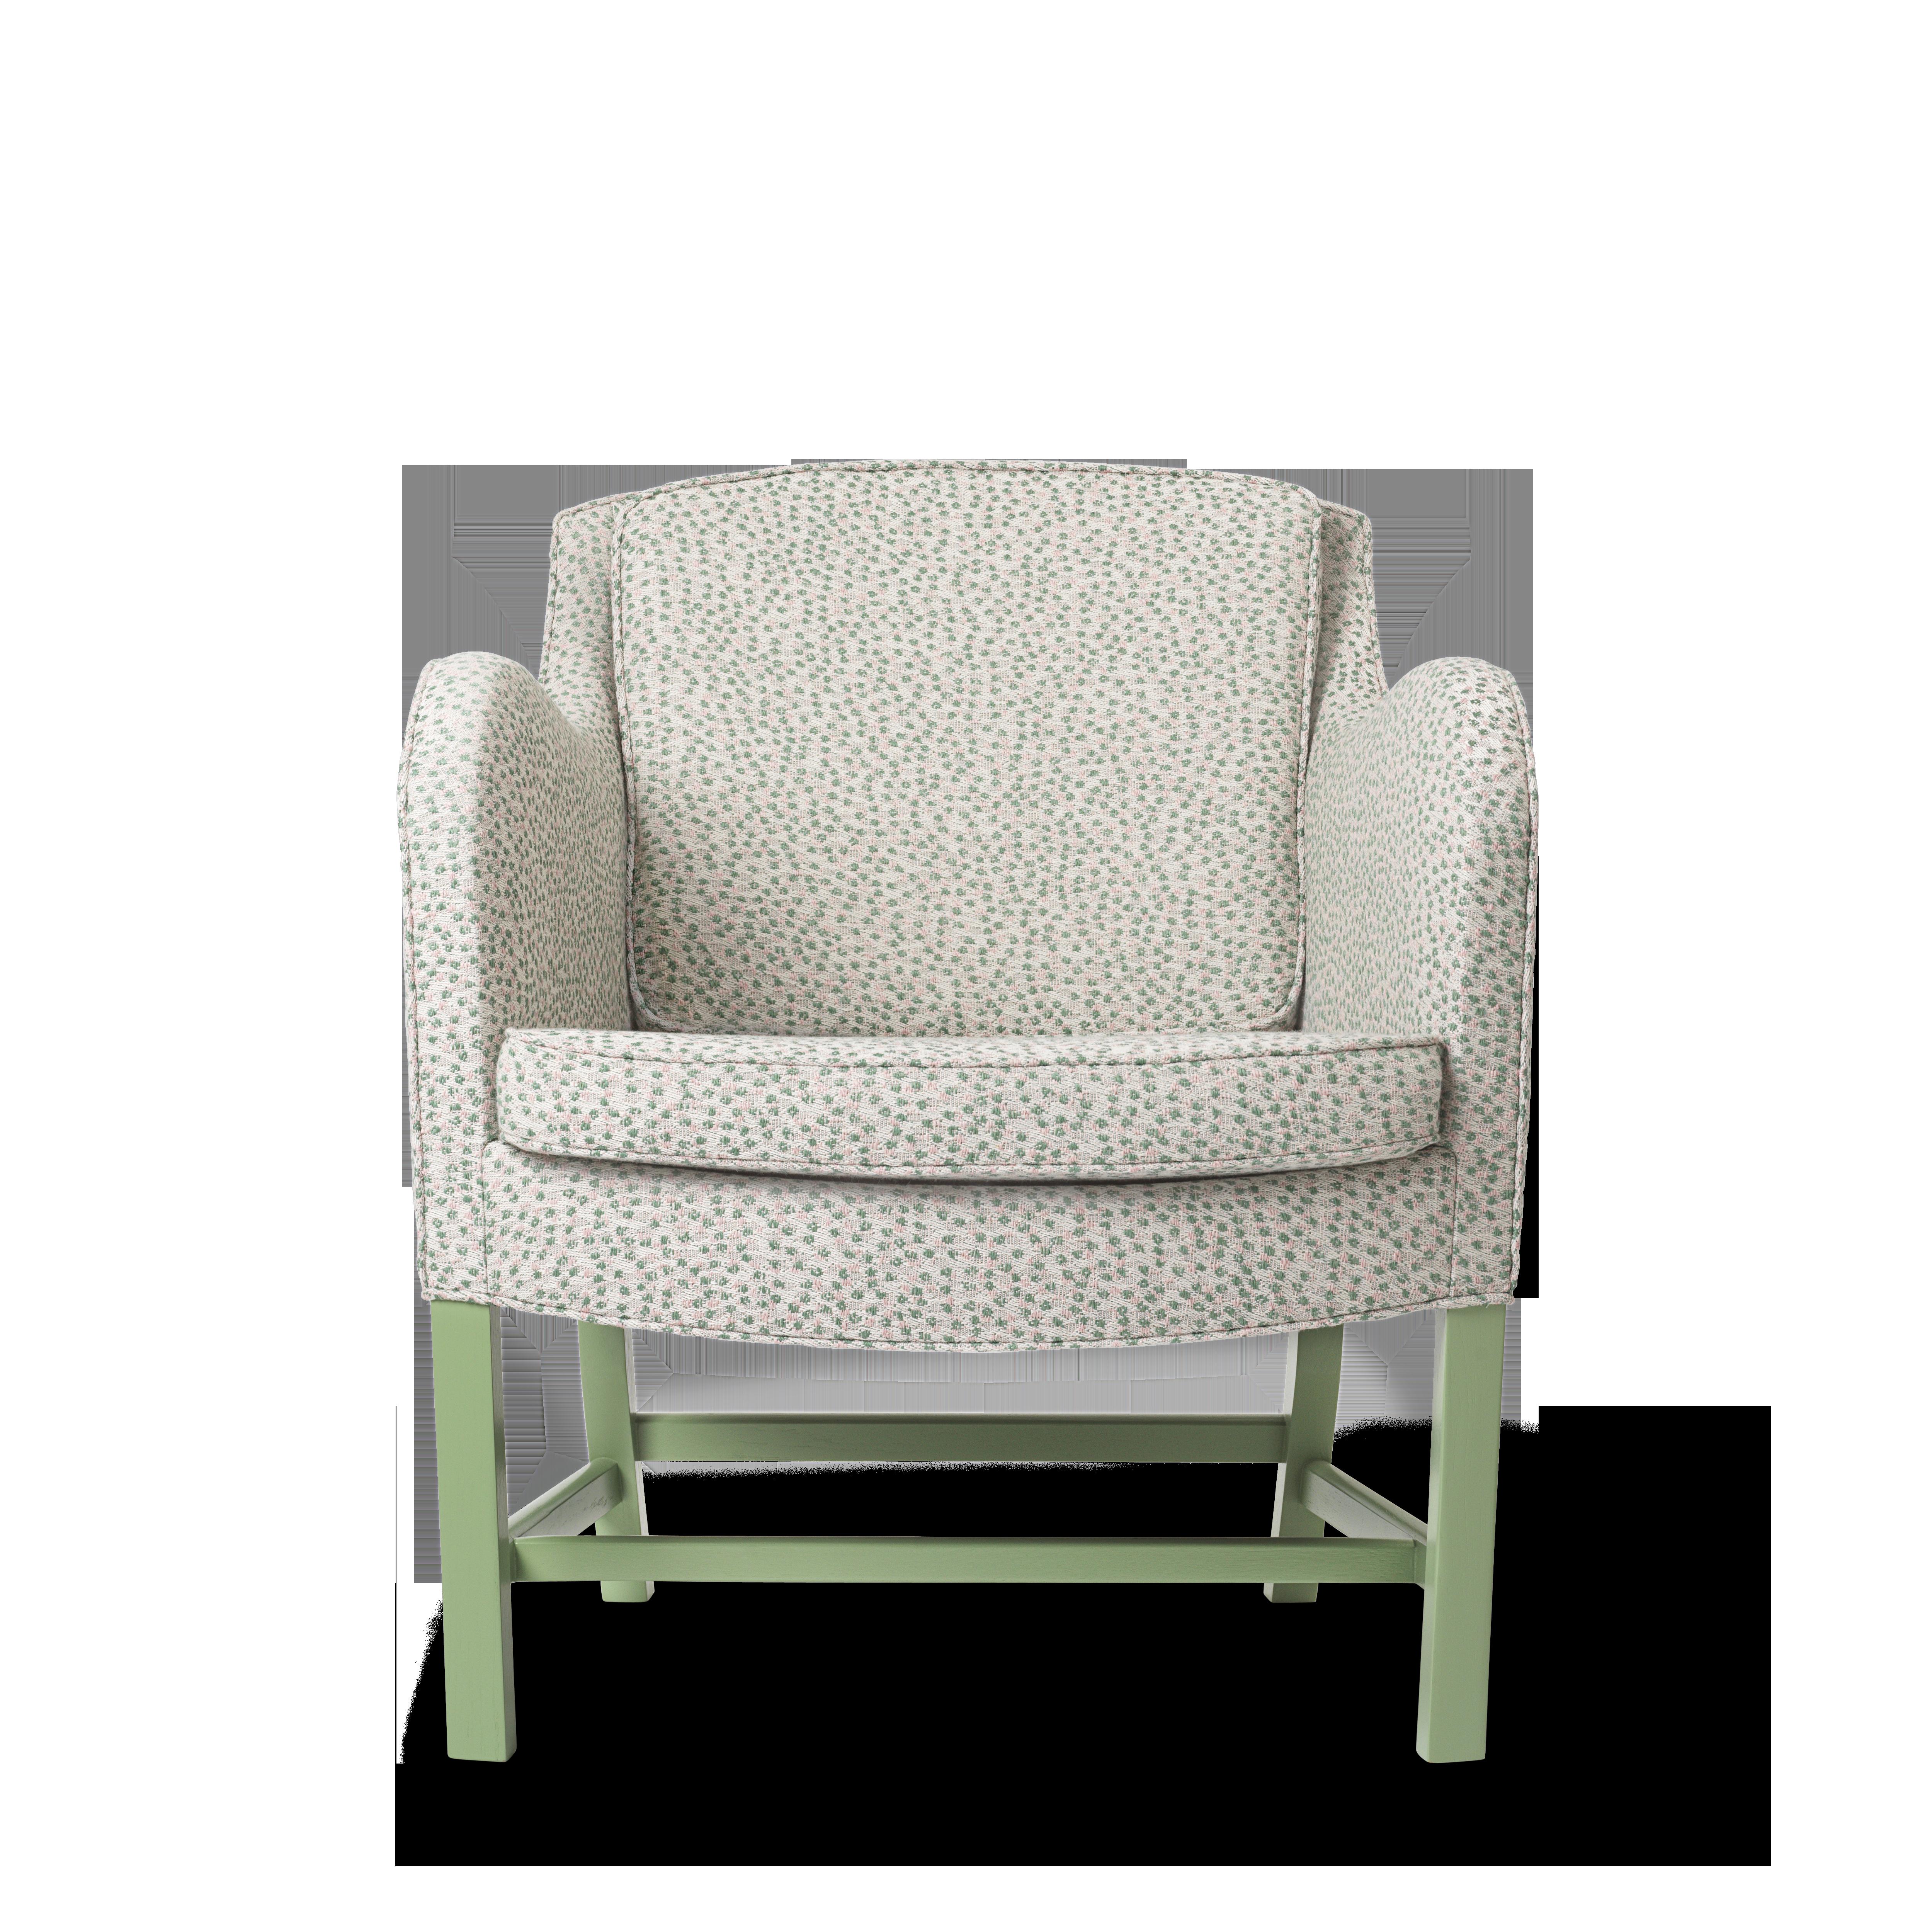 KK43960   Mix Chair Exclusive